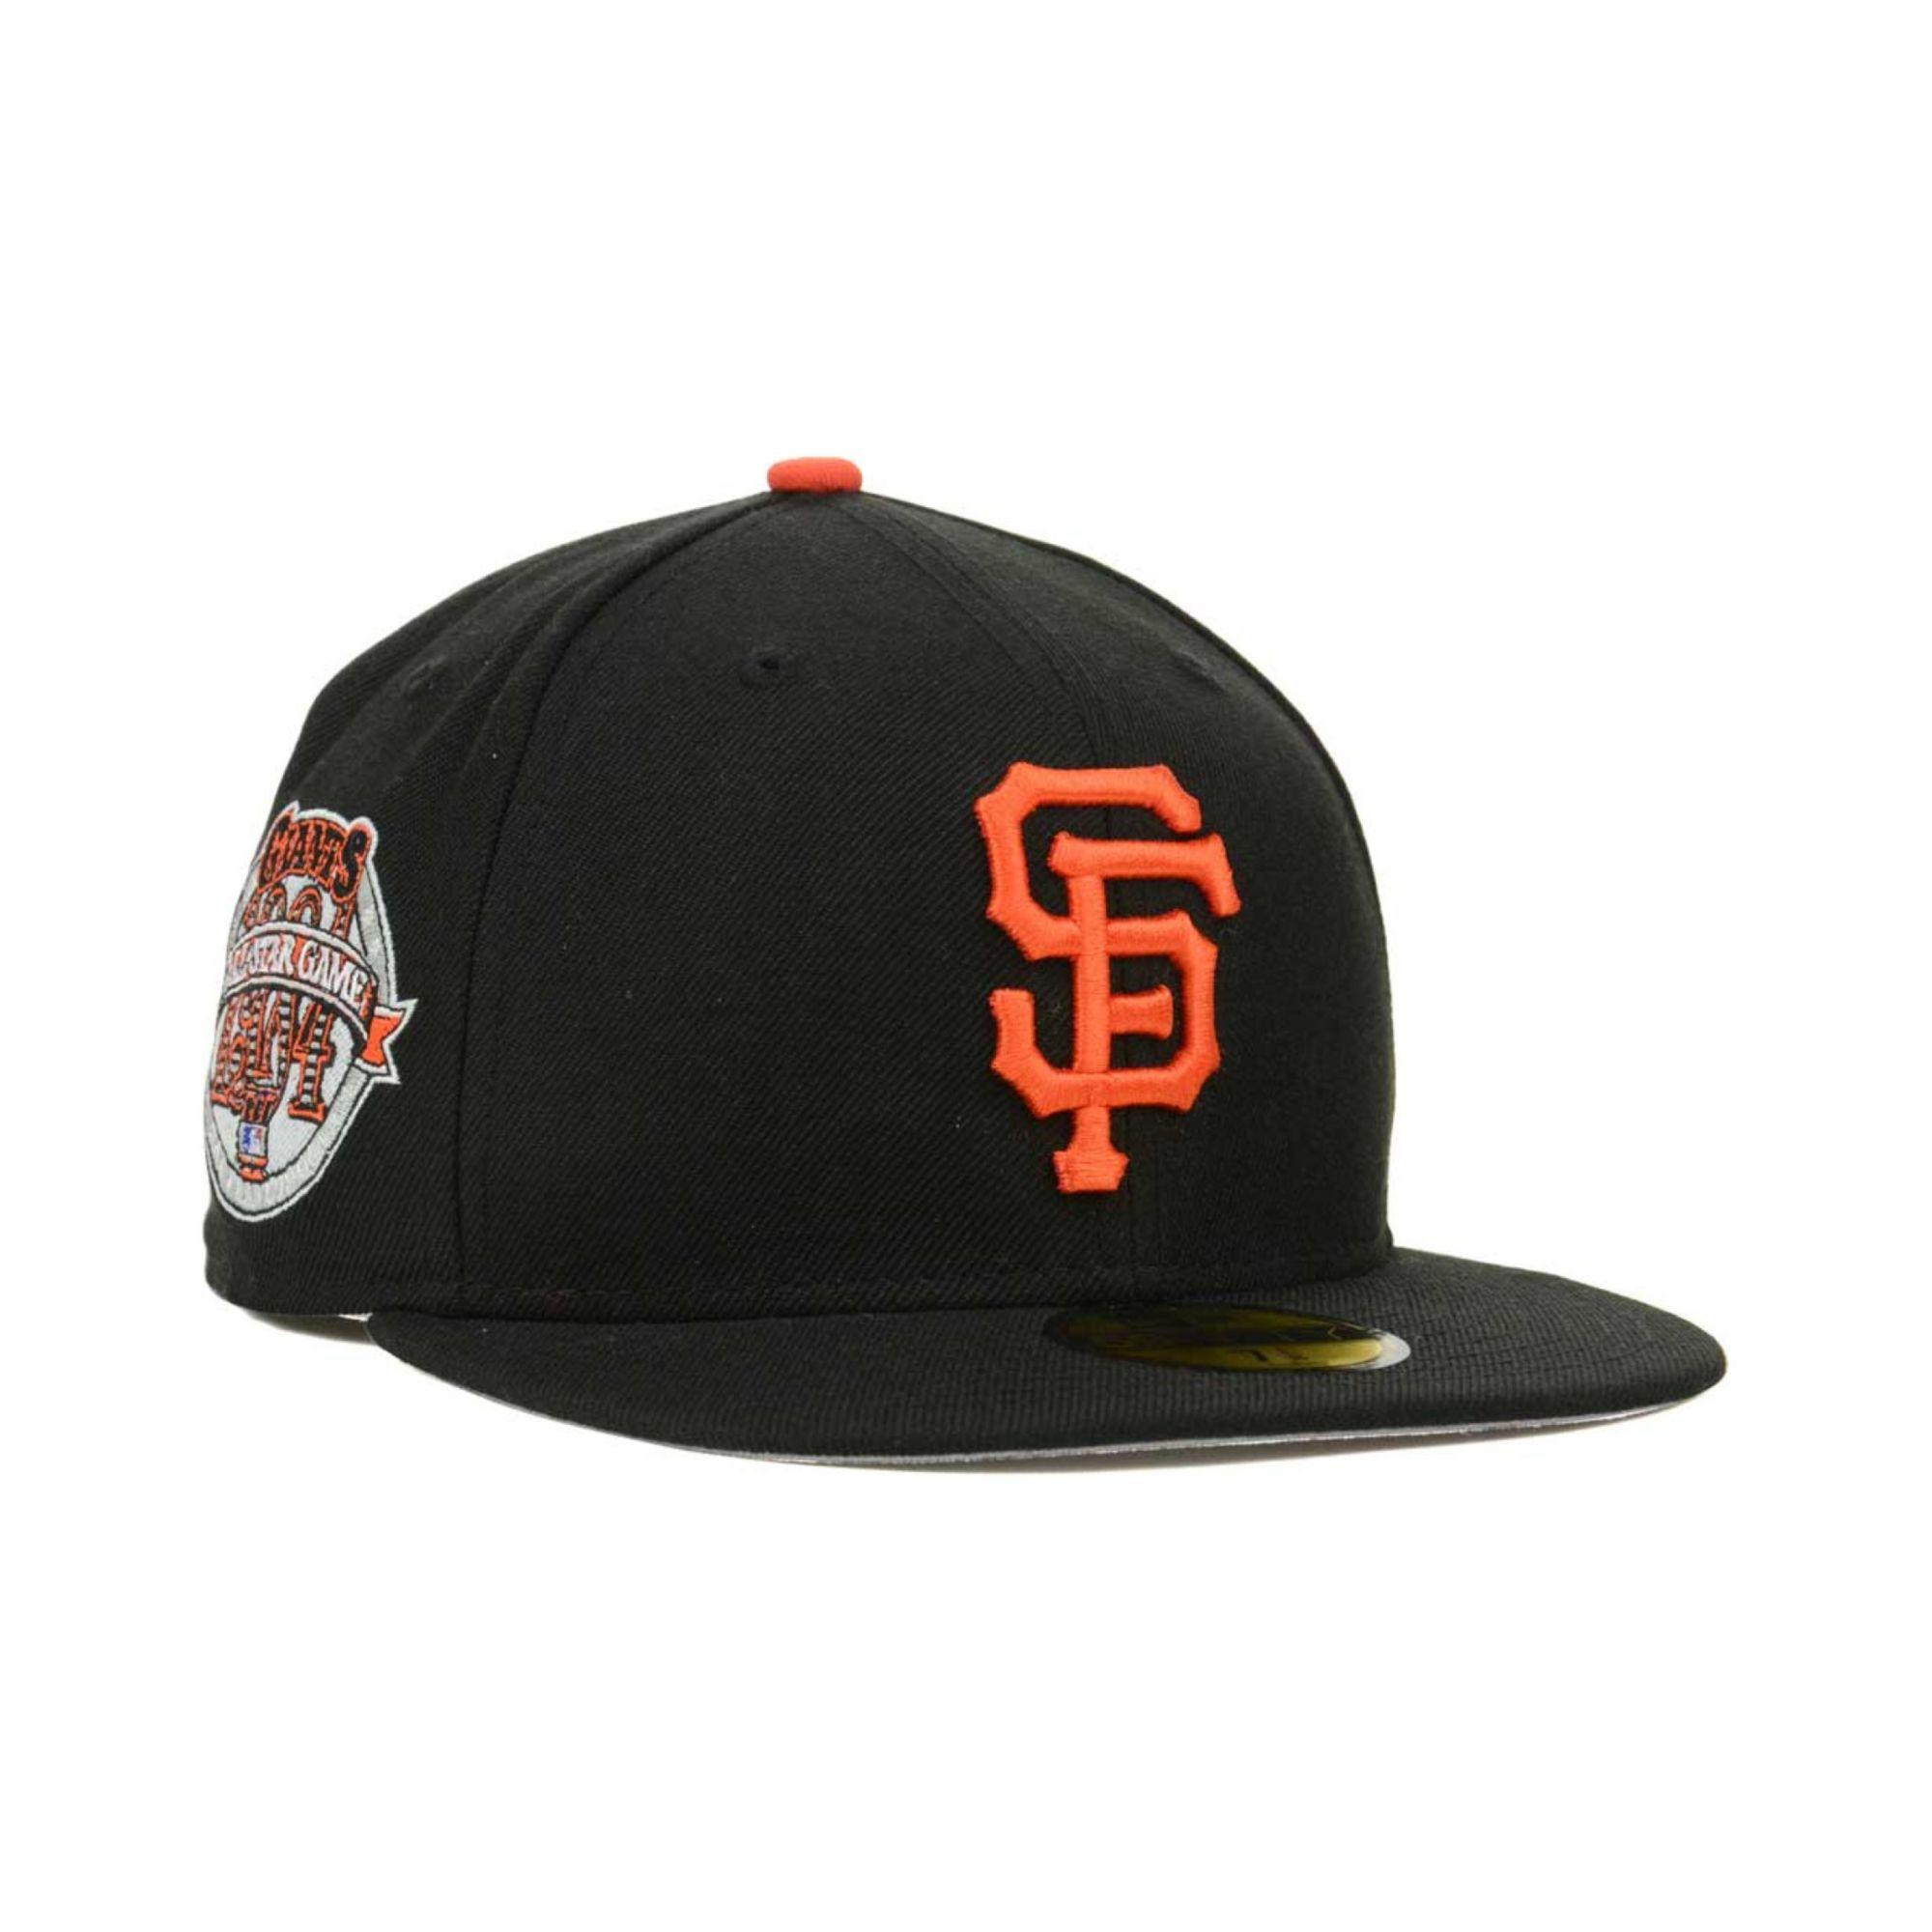 quality design 01b9e 4b109 KTZ San Francisco Giants Allstar Patch Redux 59fifty Cap in Black ...